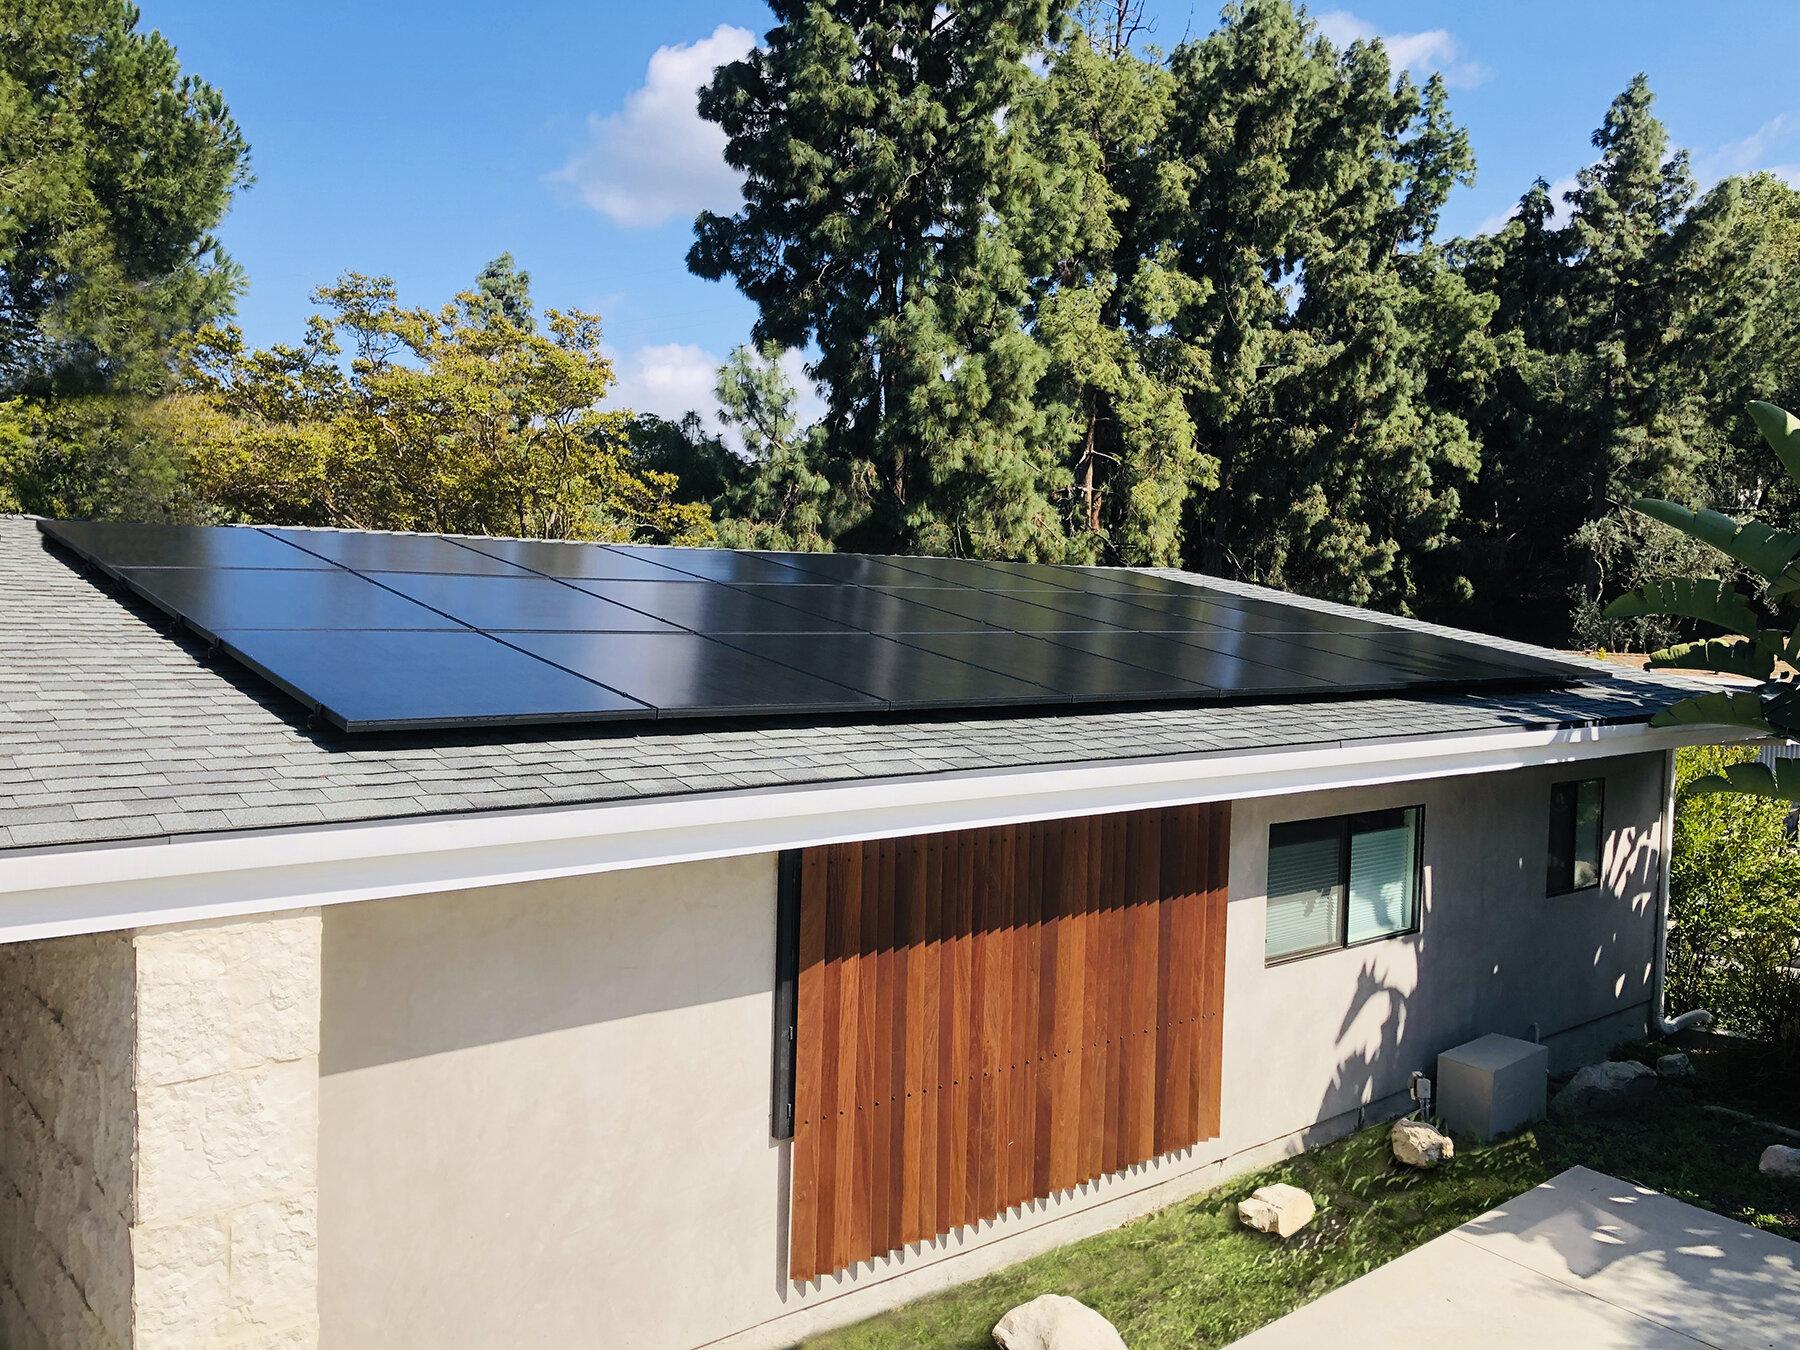 Solaria High Power Solar Panels All Black Solar Panels Solar Panels For Homes